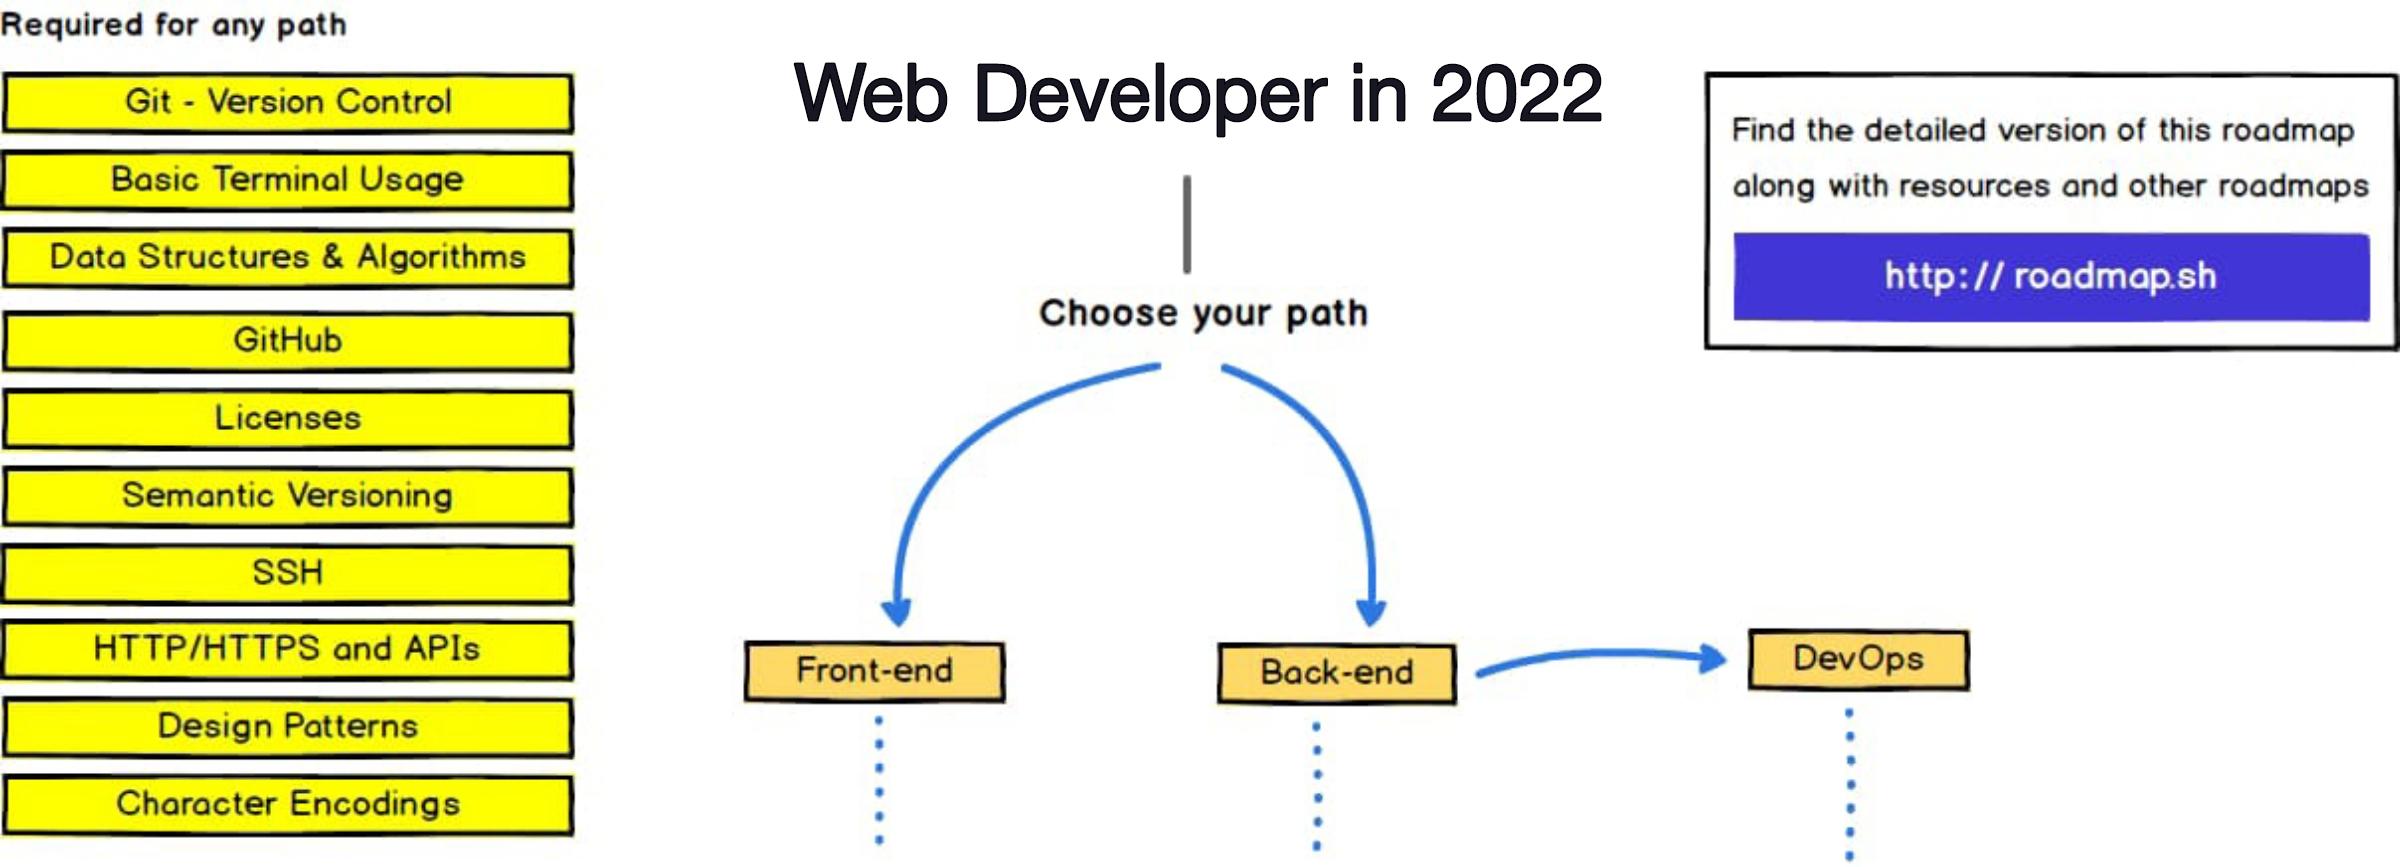 2022 Front End Developer Roadmap, Back End Developer Roadmap and DevOps Roadmaps